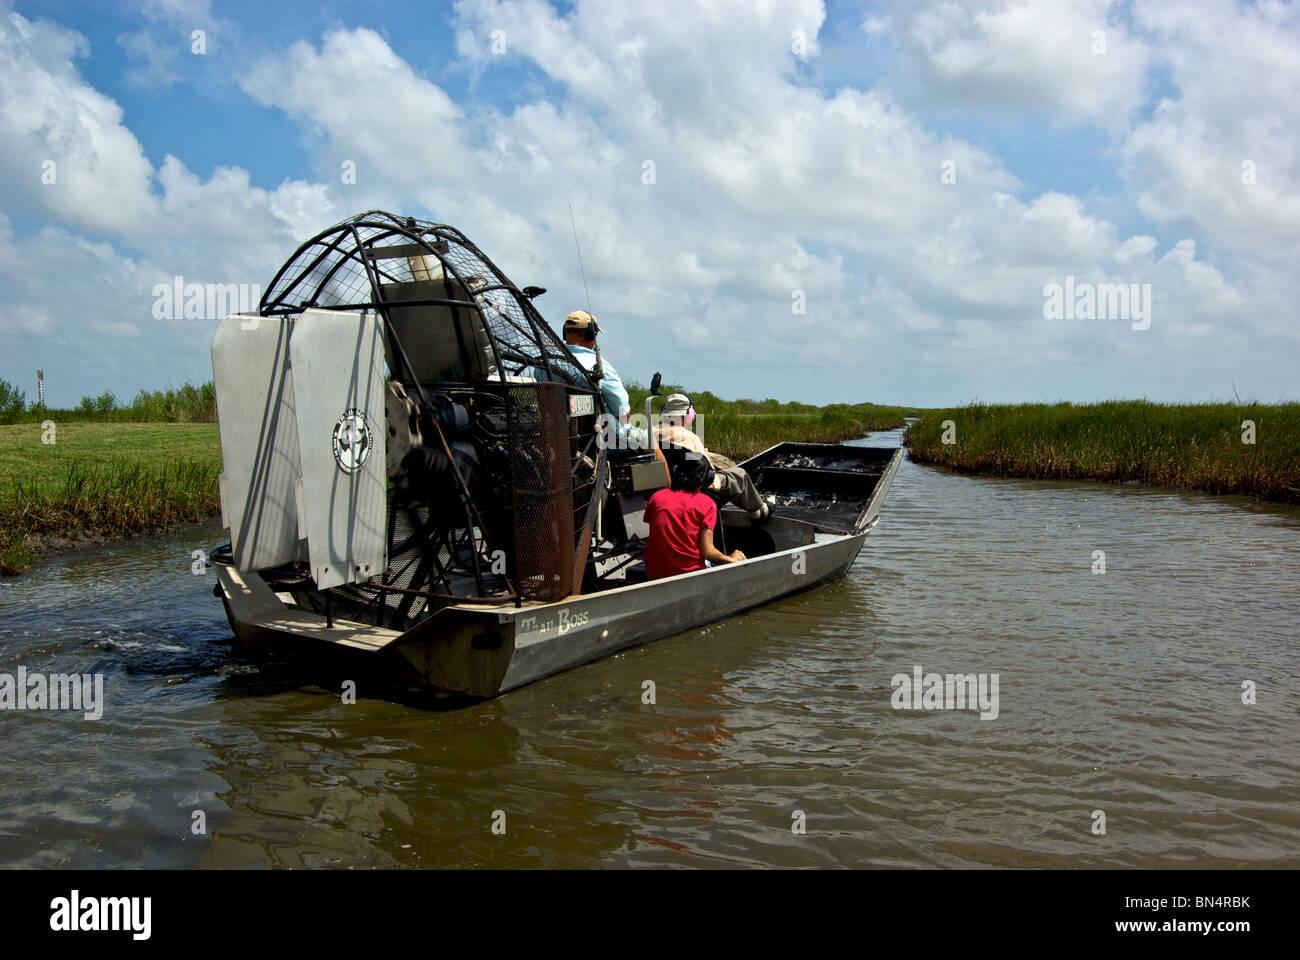 Visitors Taking Tour Of Louisiana Bayou In Big Fan Motor